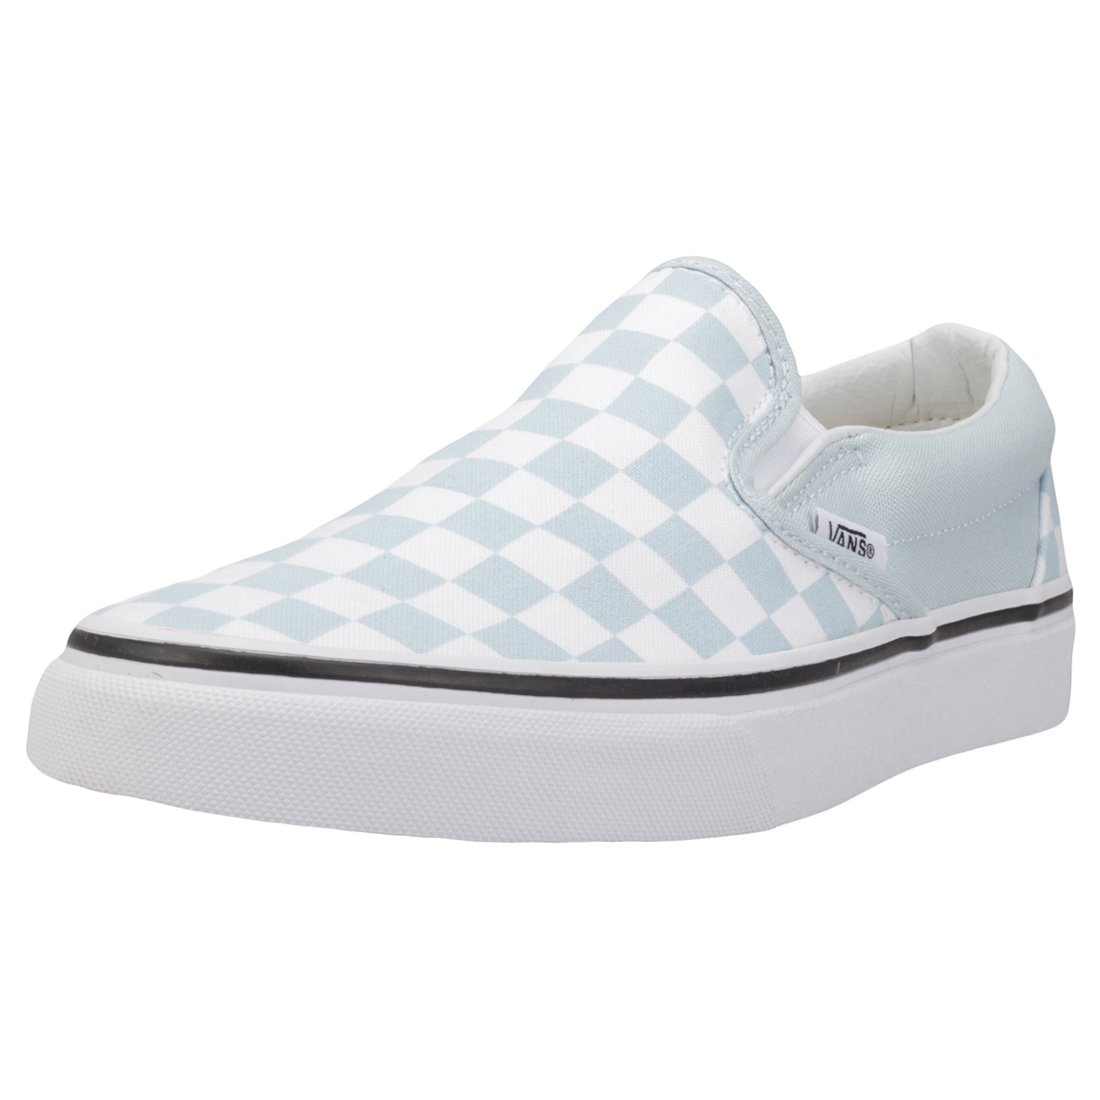 Vans Women's Classic Slip on Trainers, Blue ((Checkerboard) Baby Blue/True White Qck), 7 UK 40.5 EU